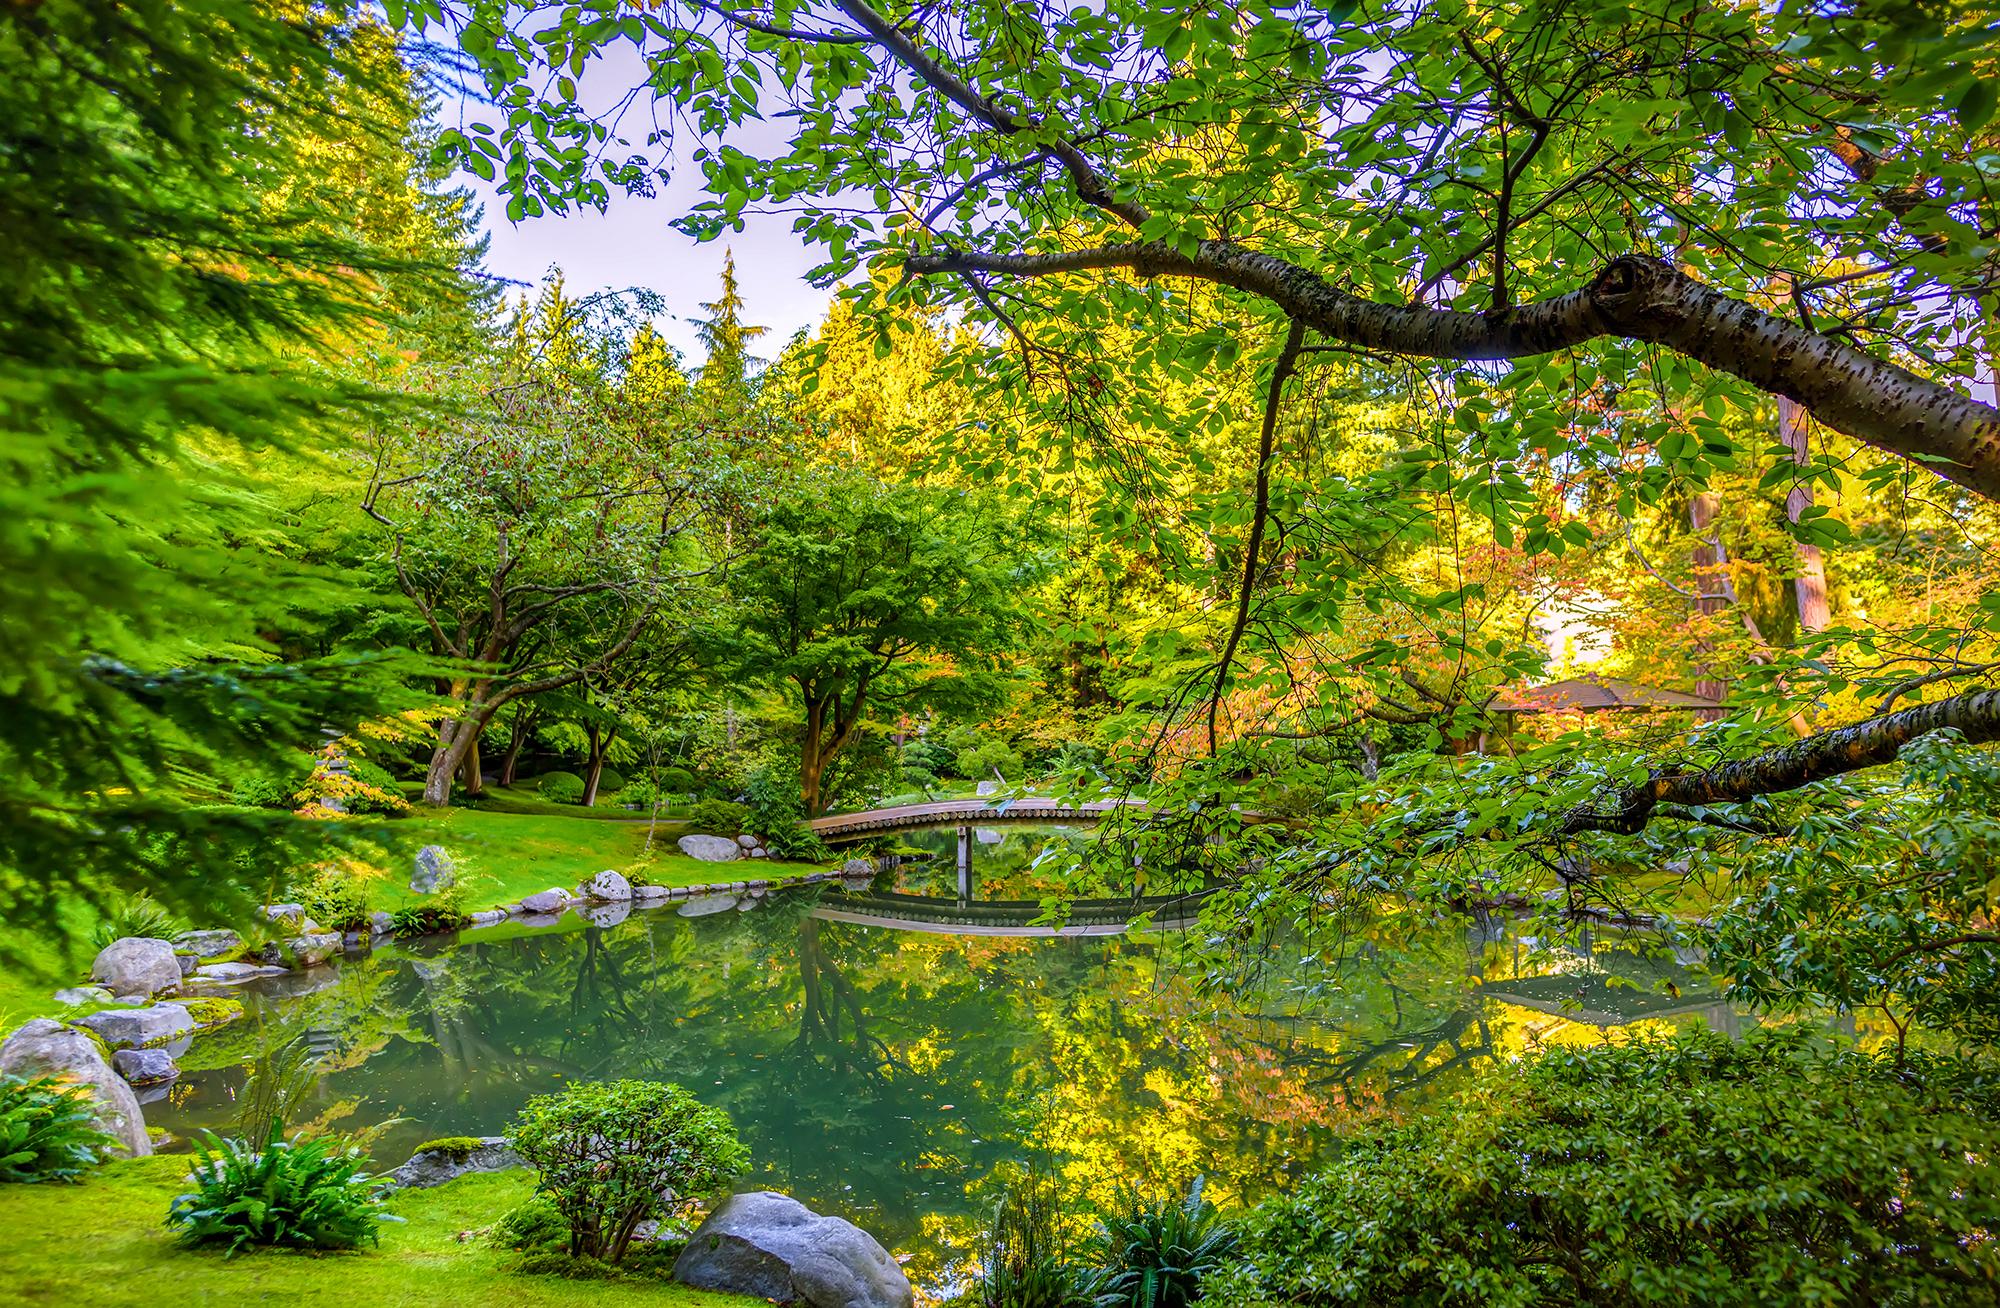 Peaceful afternoon at Nitobe Memorial Garden.